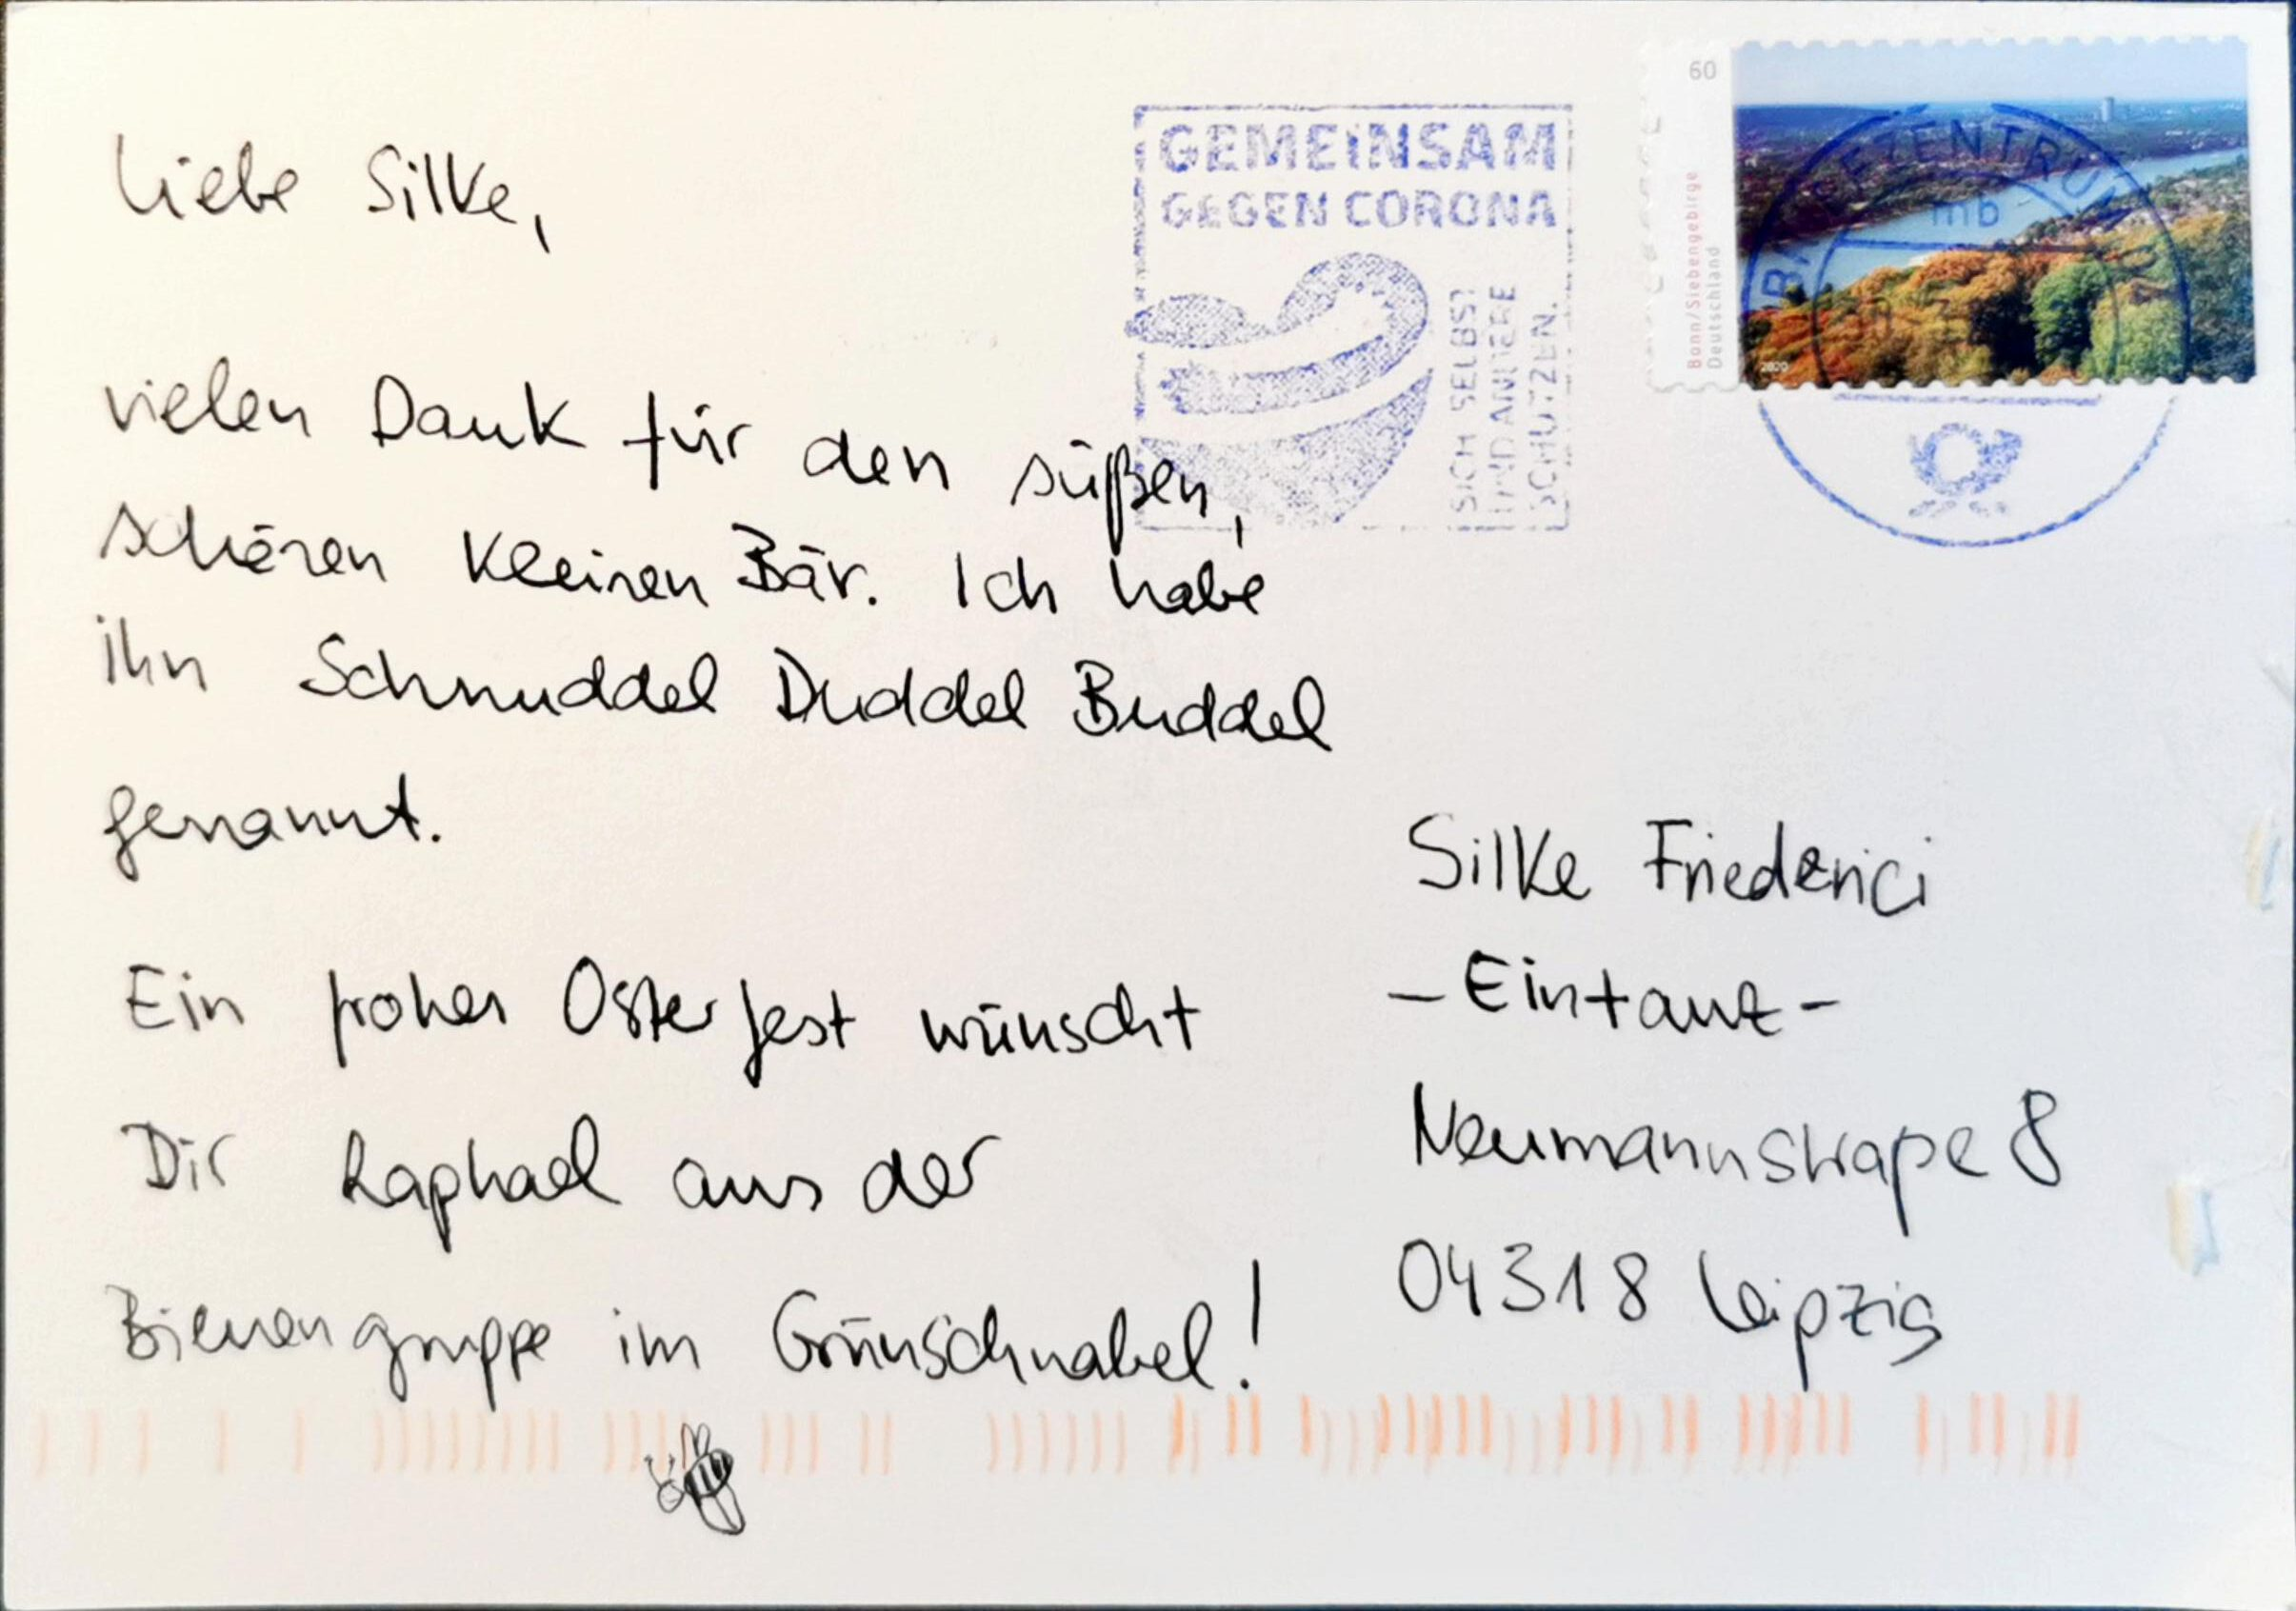 08 Osterdanke - Raphael Grünschnabel (1)